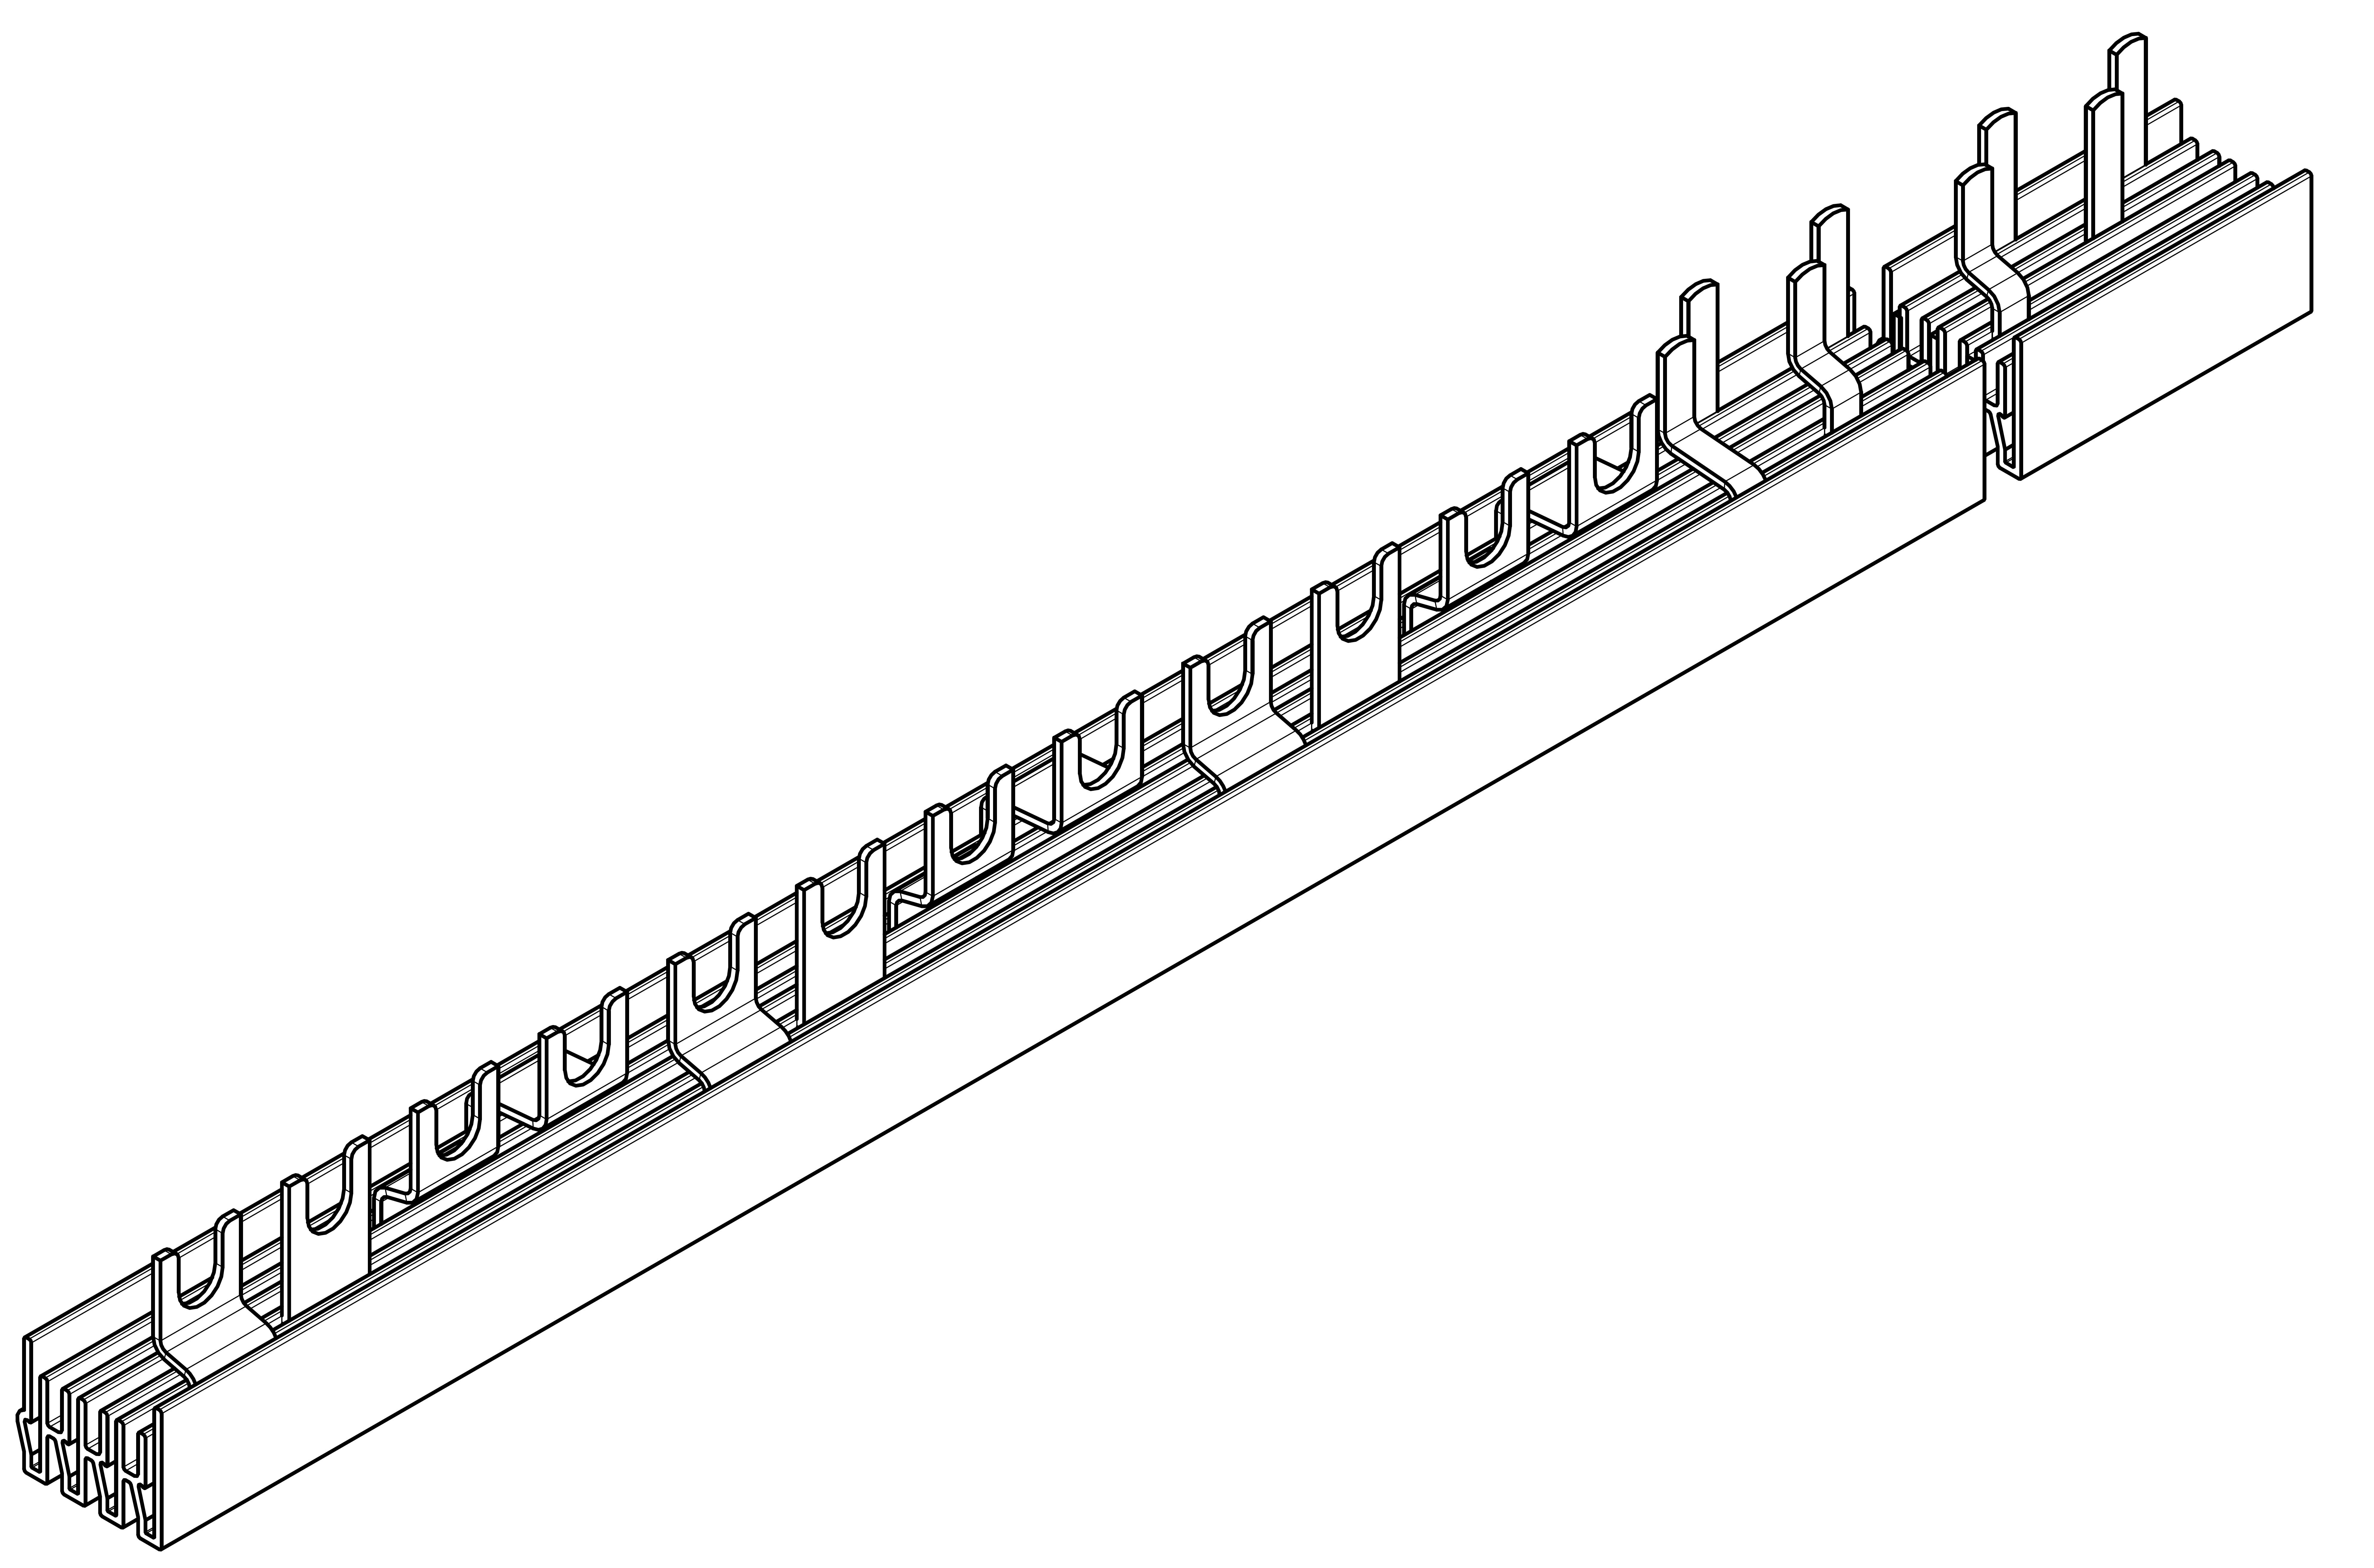 1 Stk Verschienung Compact 3 x FI 4-polig,18 x LS 1+N auf 1TE BS990162--